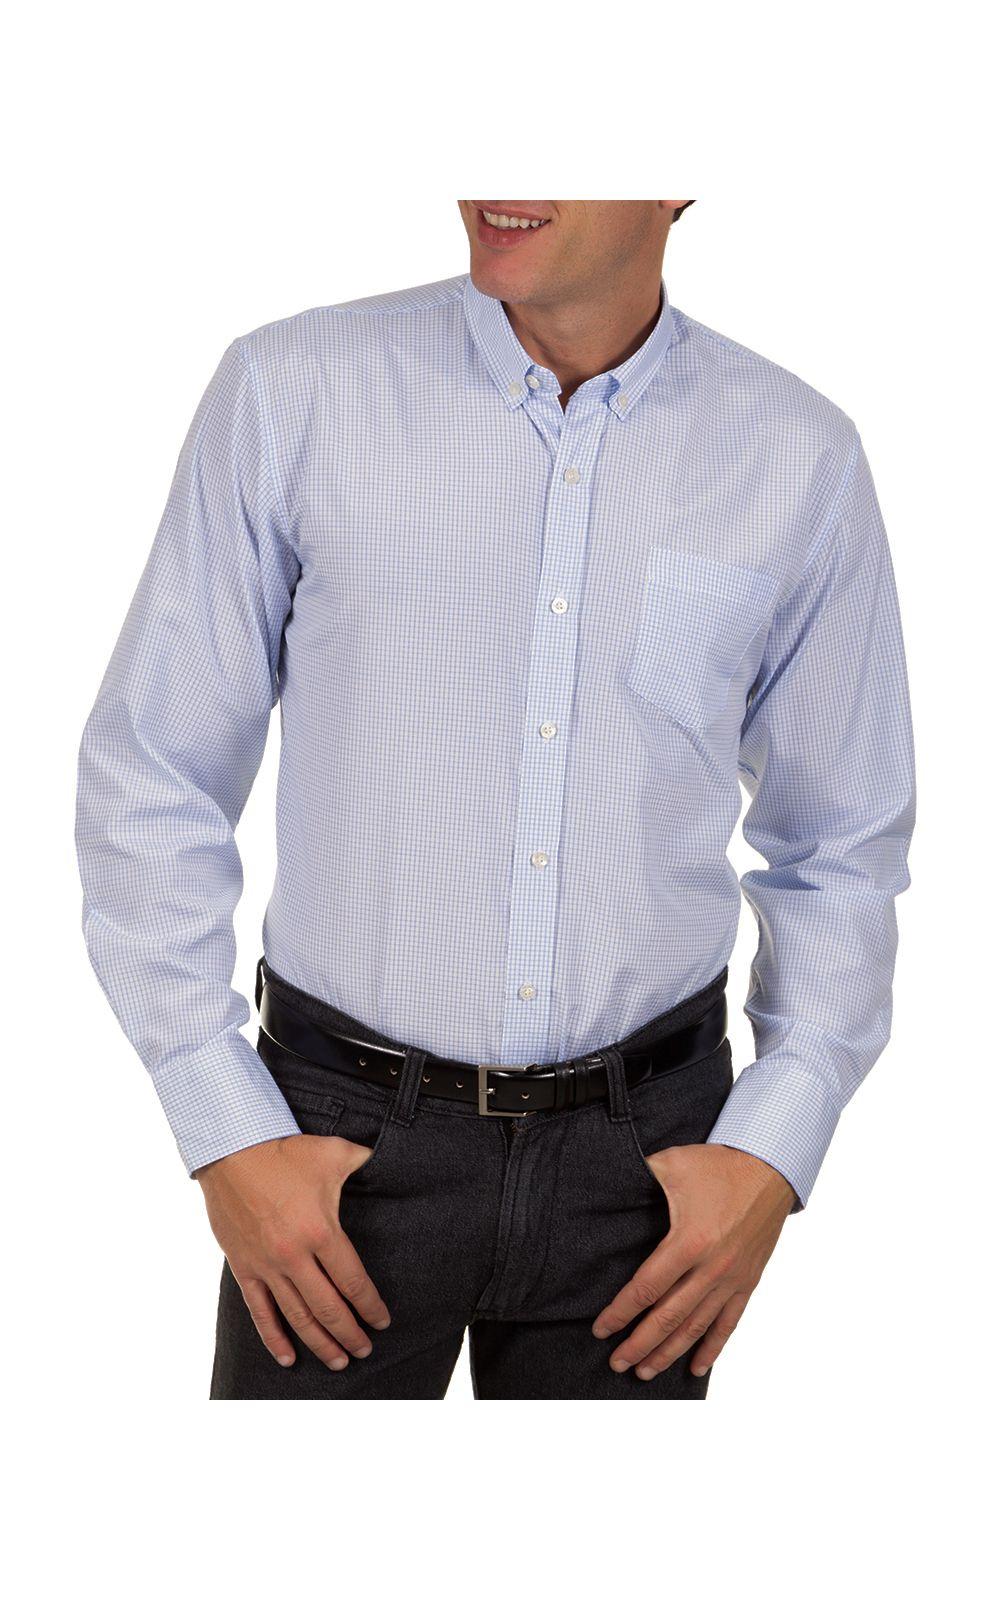 Foto 1 - Camisa Social Masculina Azul Claro Xadrez